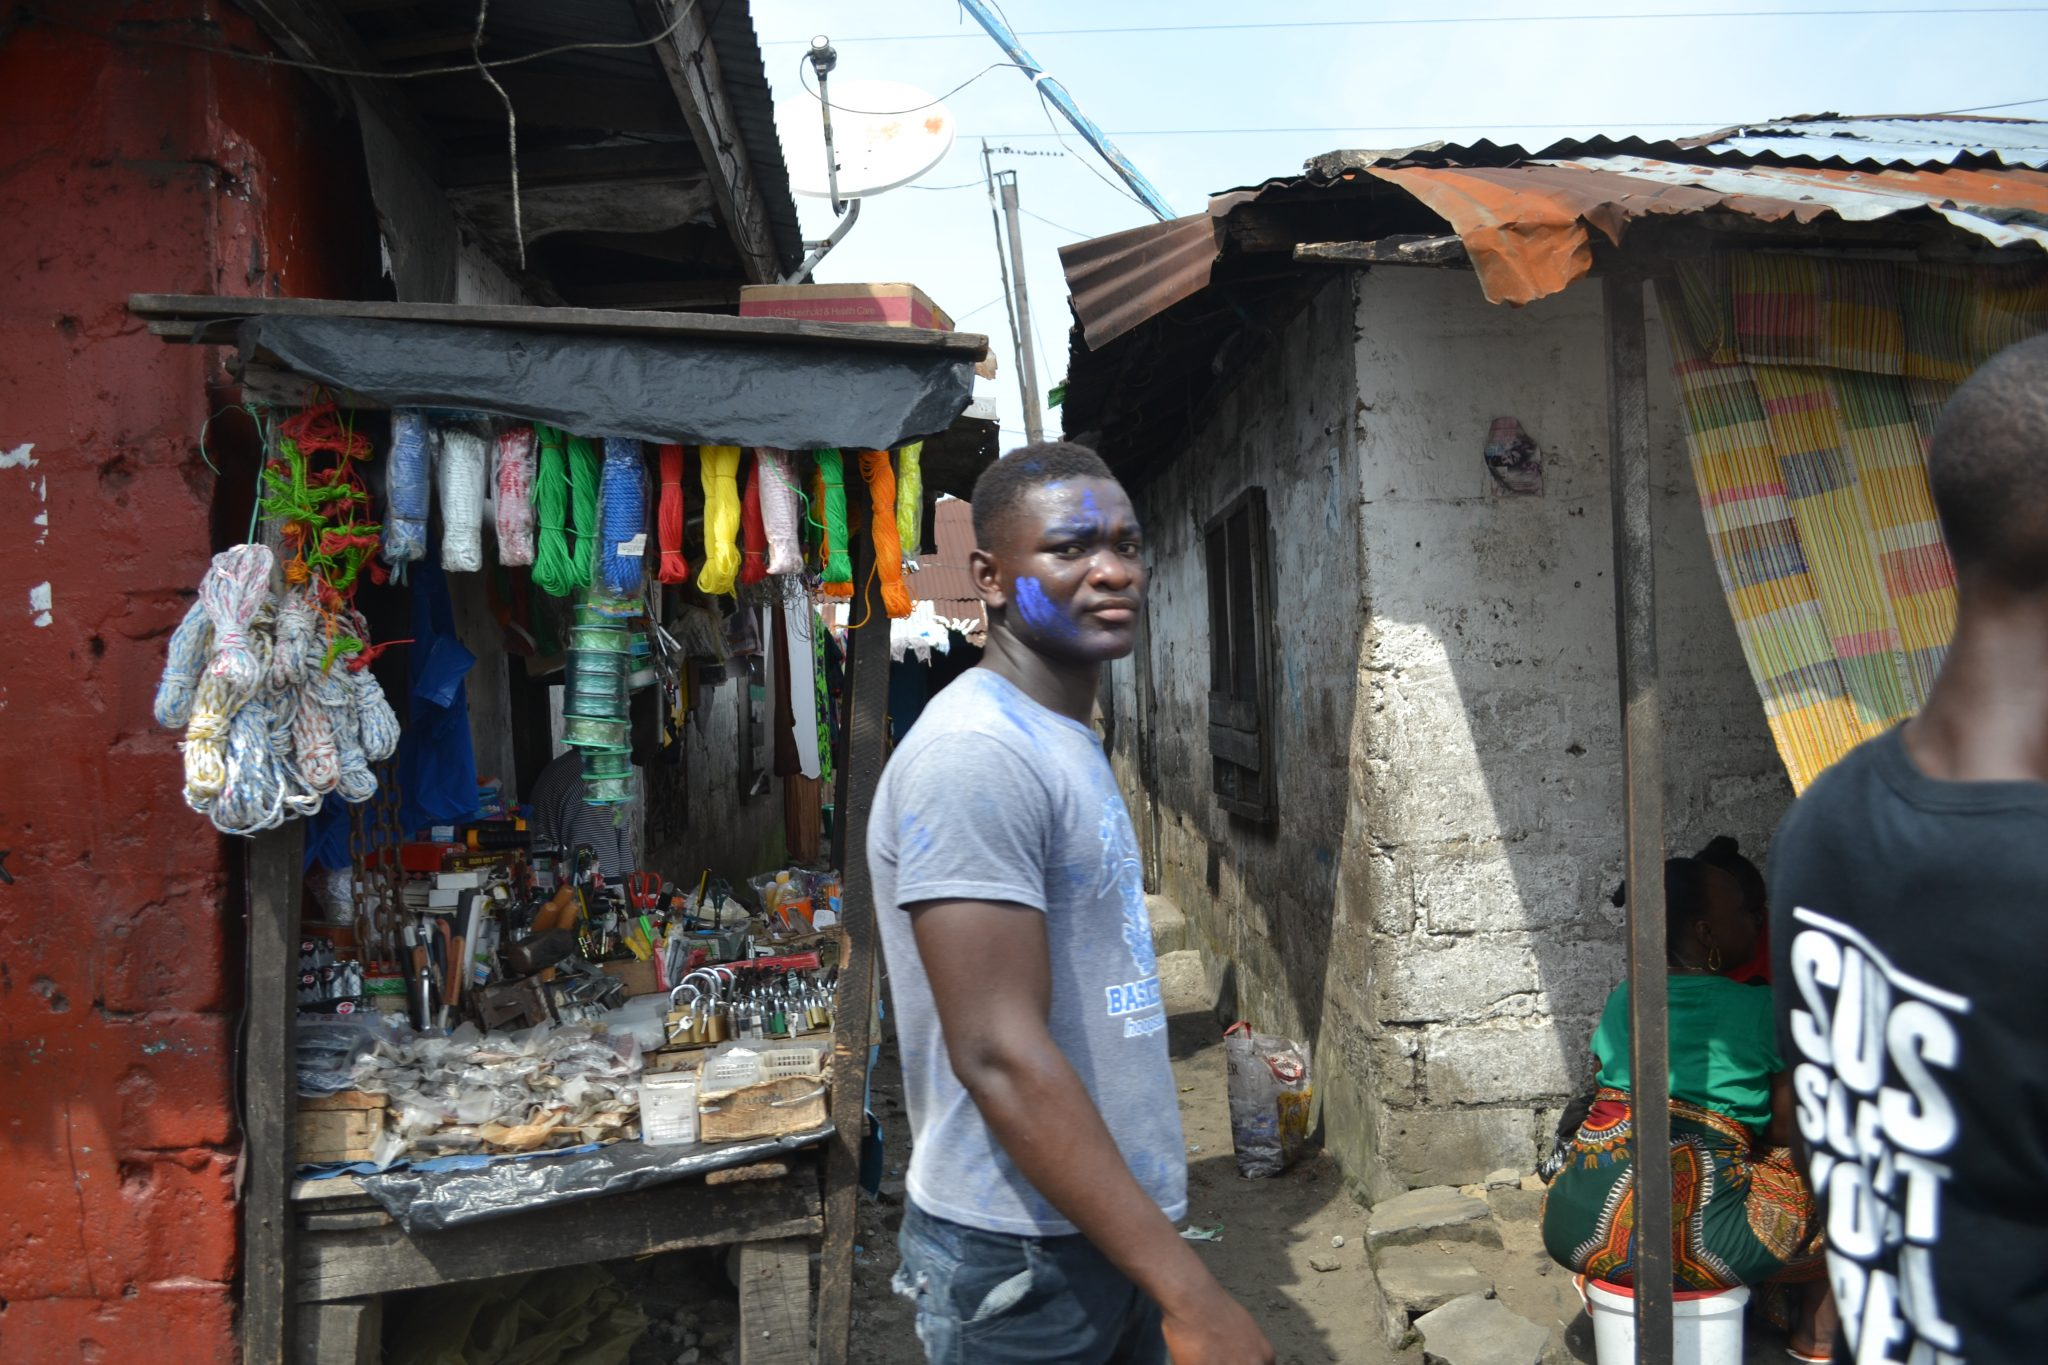 Street in West Point, one of Monrovia's largest slum communities. Photo: Anna-Carin Hall / Kvinna till Kvinna